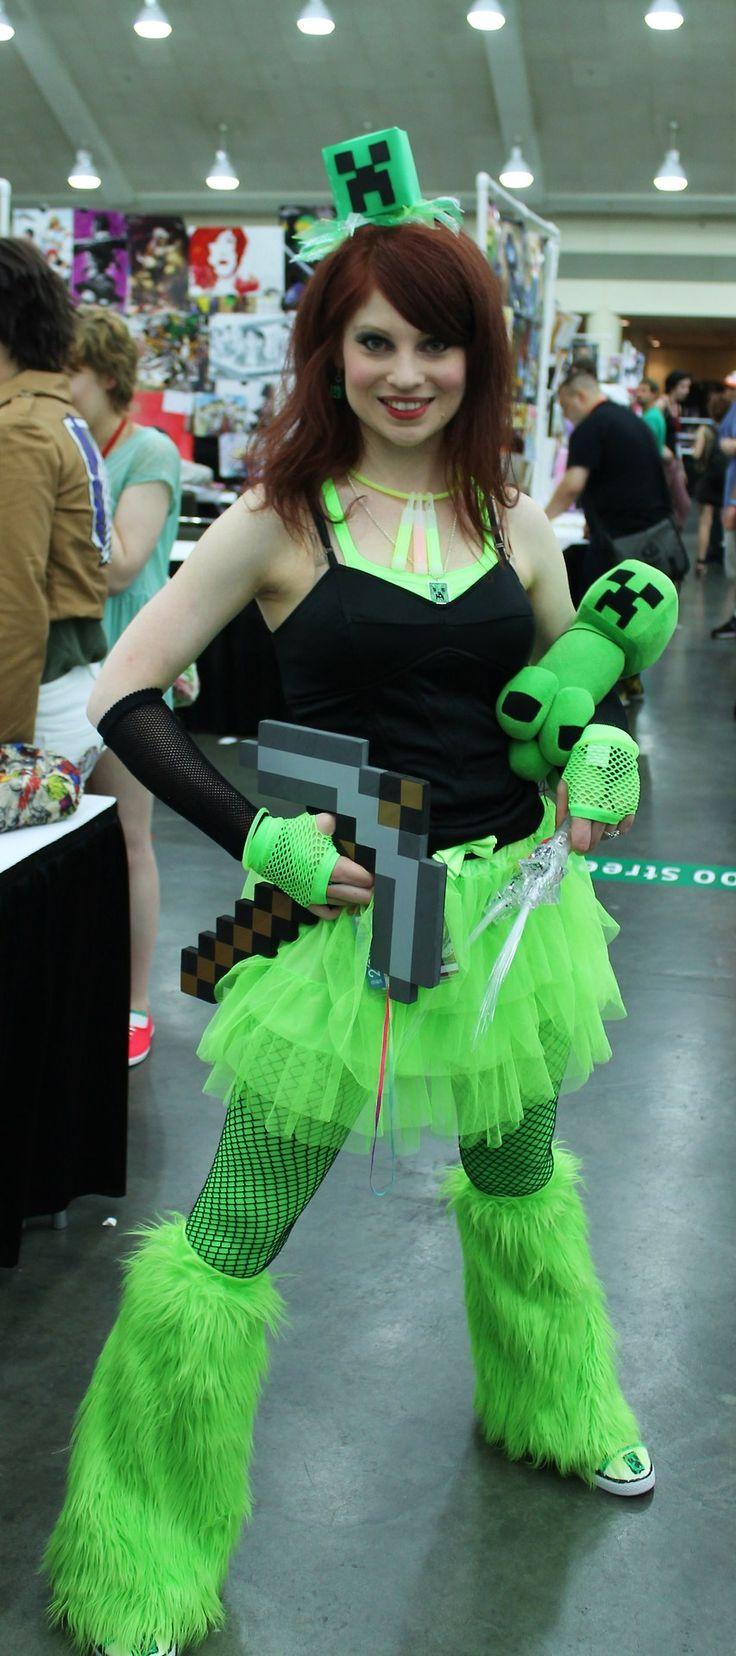 Creeper Wallpaper Hd Minecraft Creeper Cosplay Girl Minecraft Pinterest